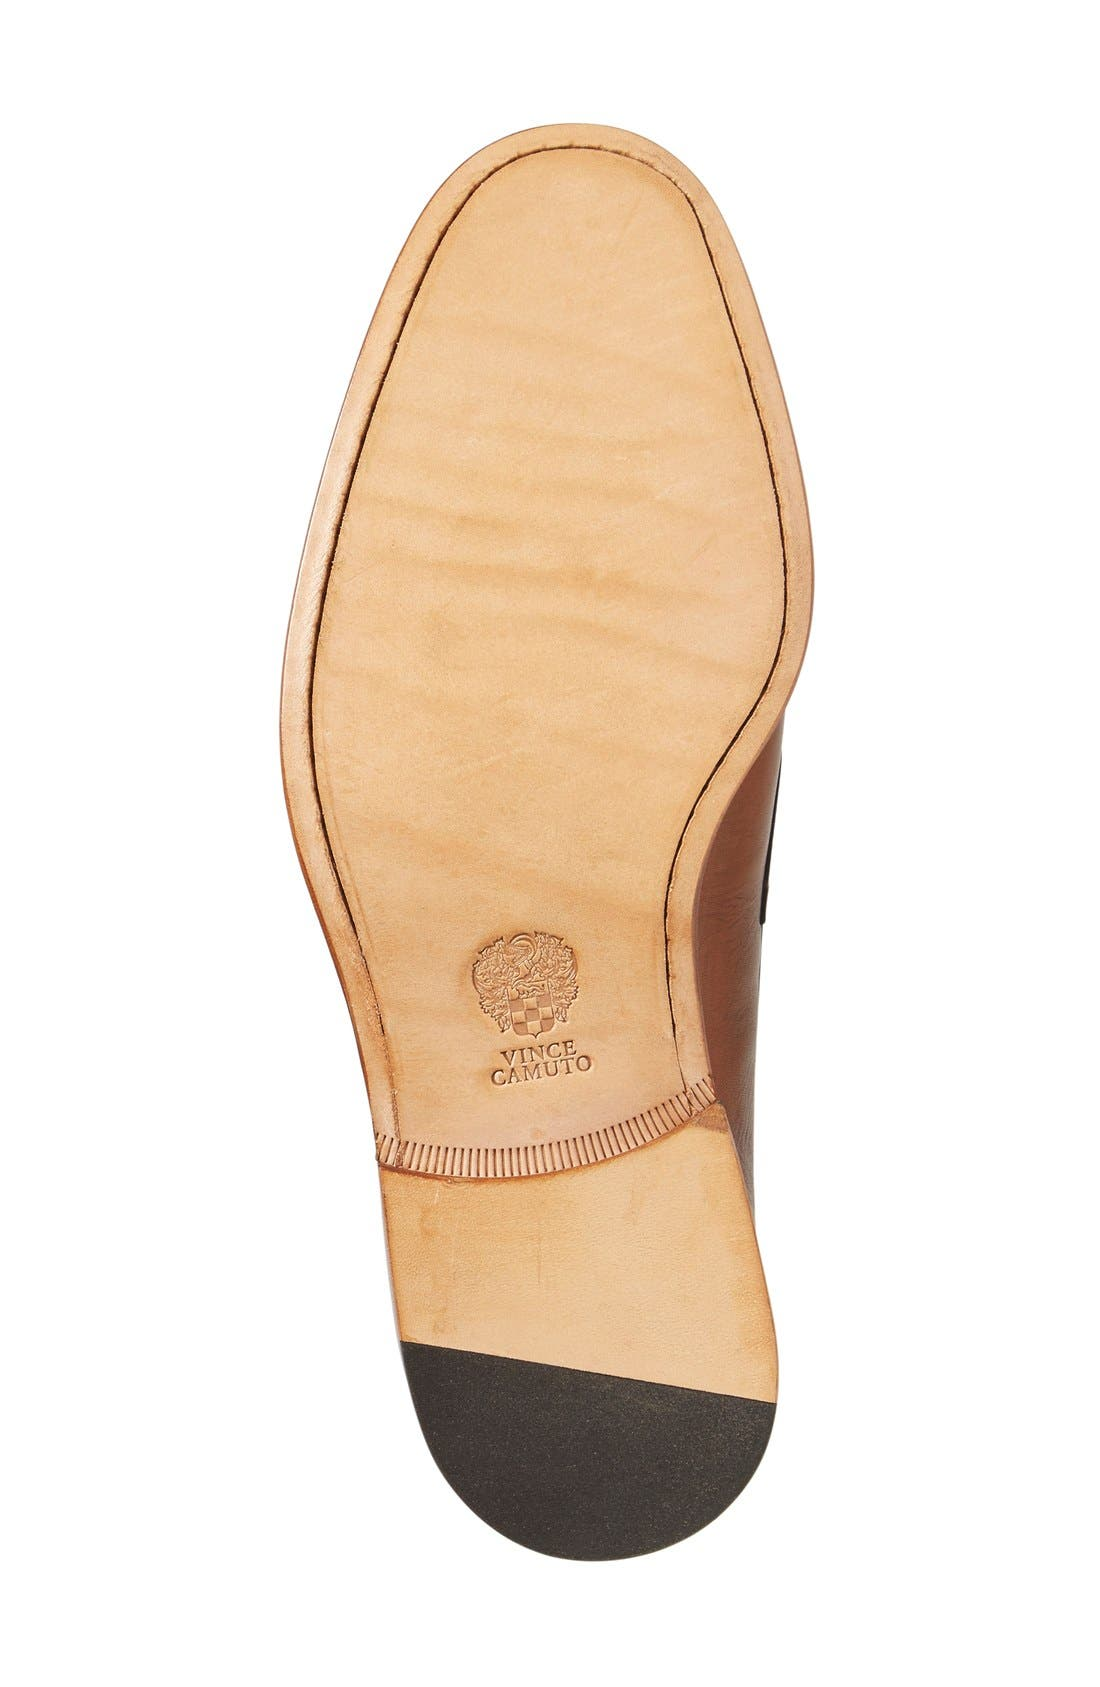 'Nacher' Loafer,                             Alternate thumbnail 3, color,                             Cognac Leather